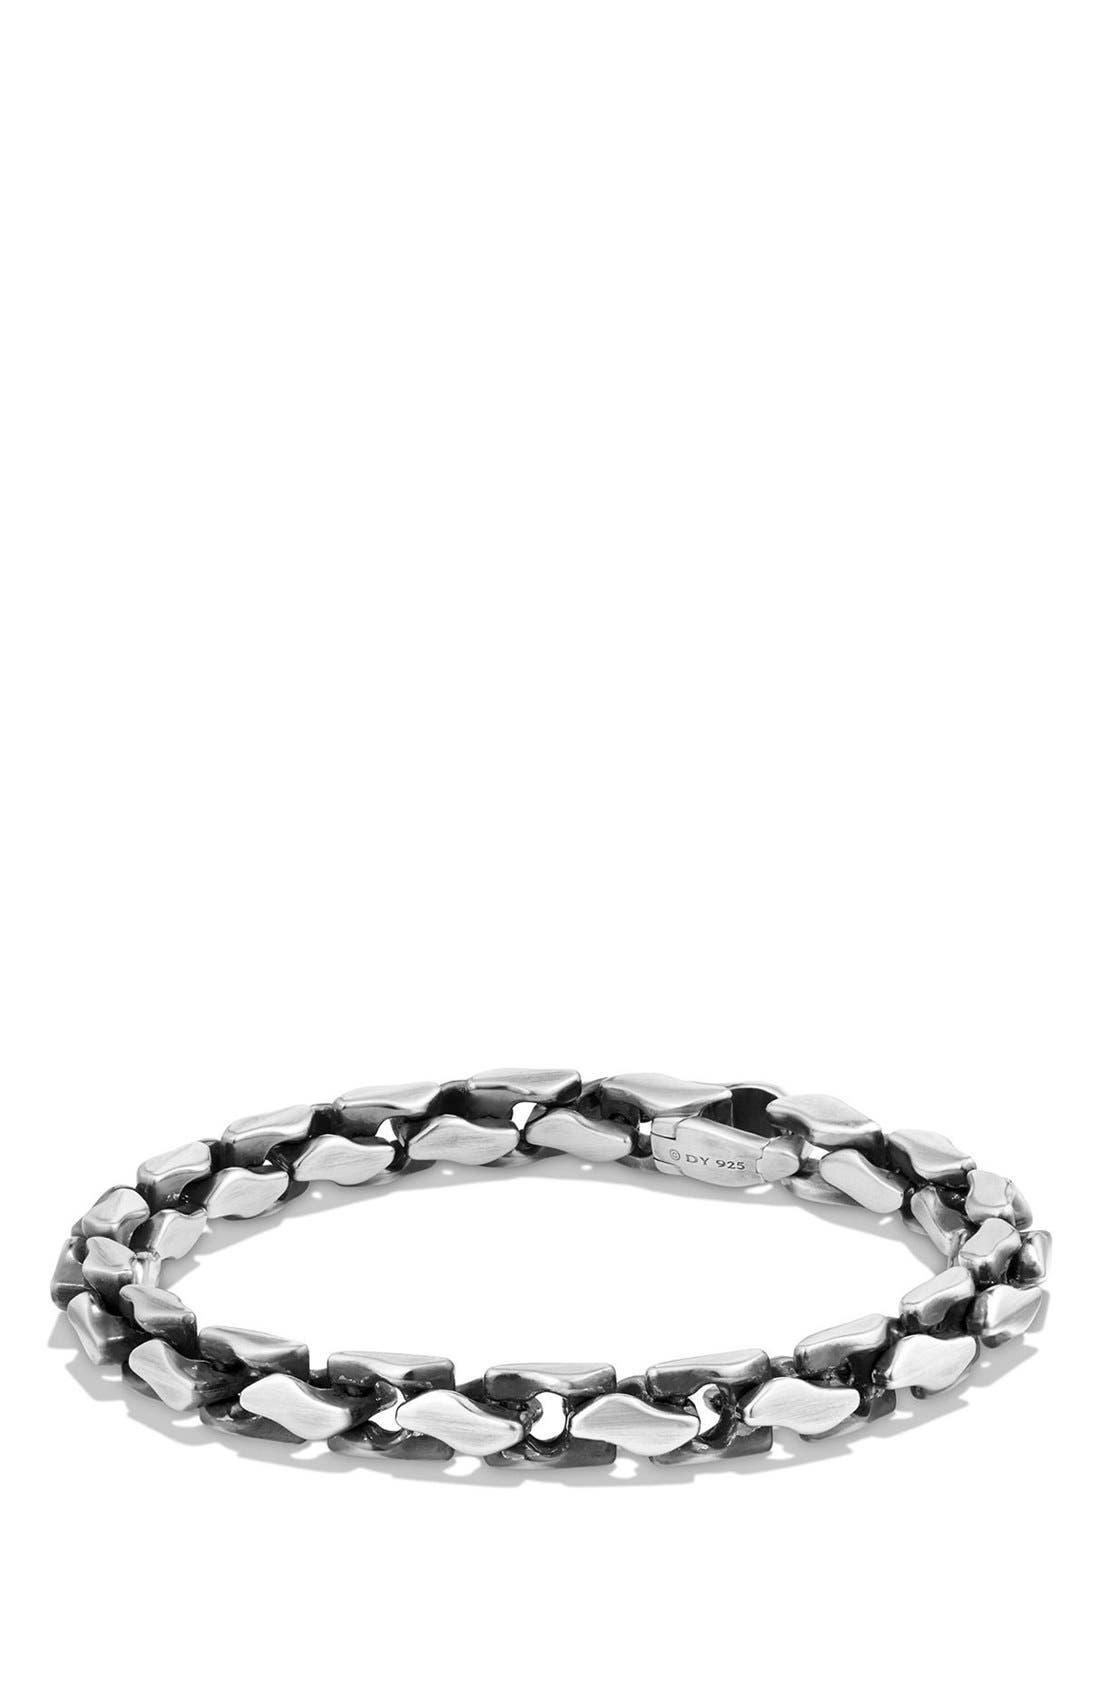 Main Image - David Yurman 'Chain Collection' Bracelet